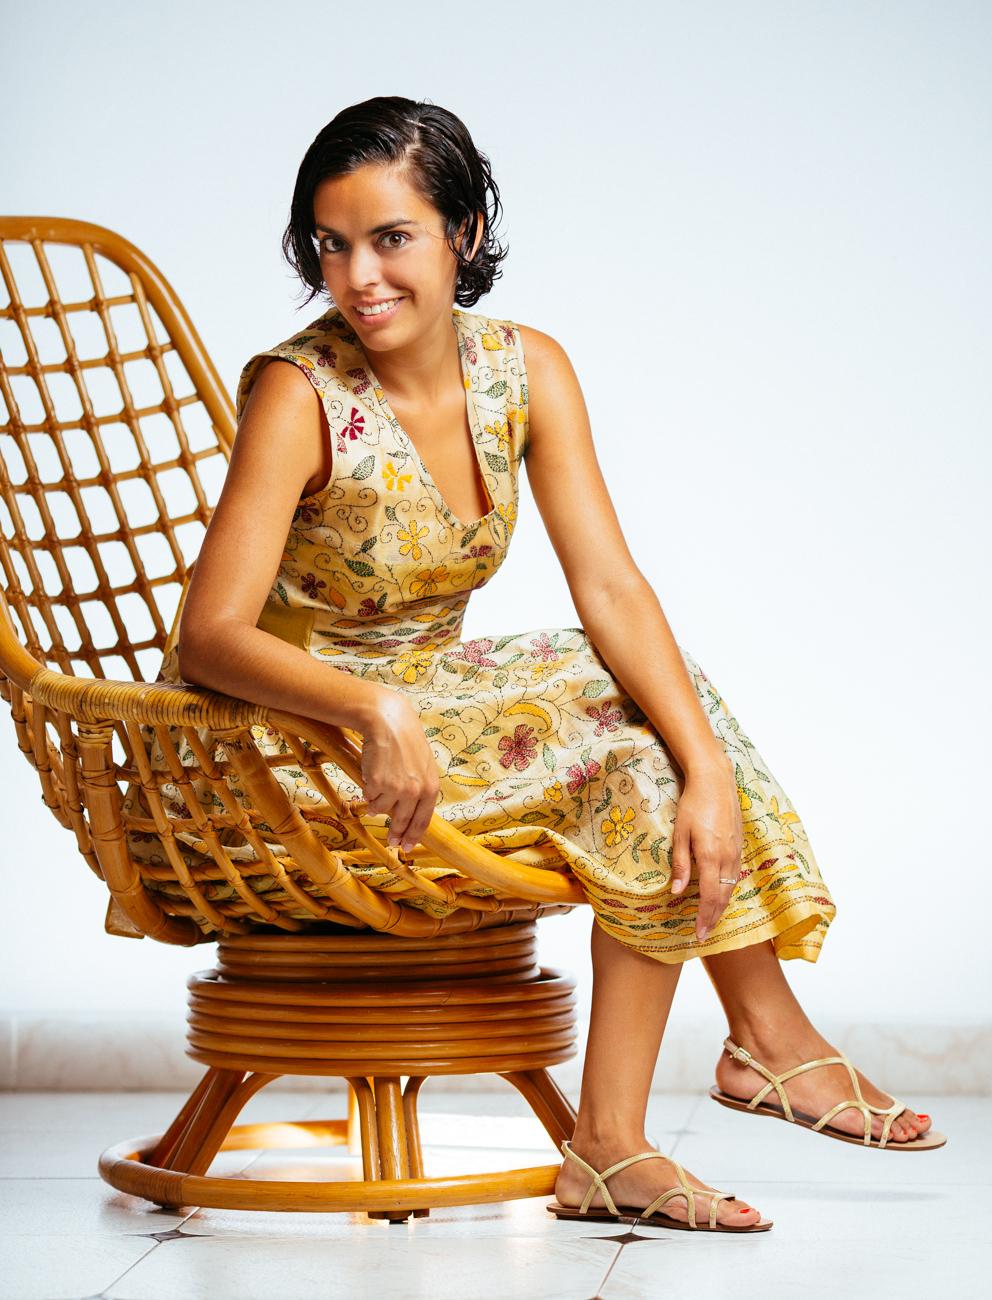 LADM Vestido Amarillo 02